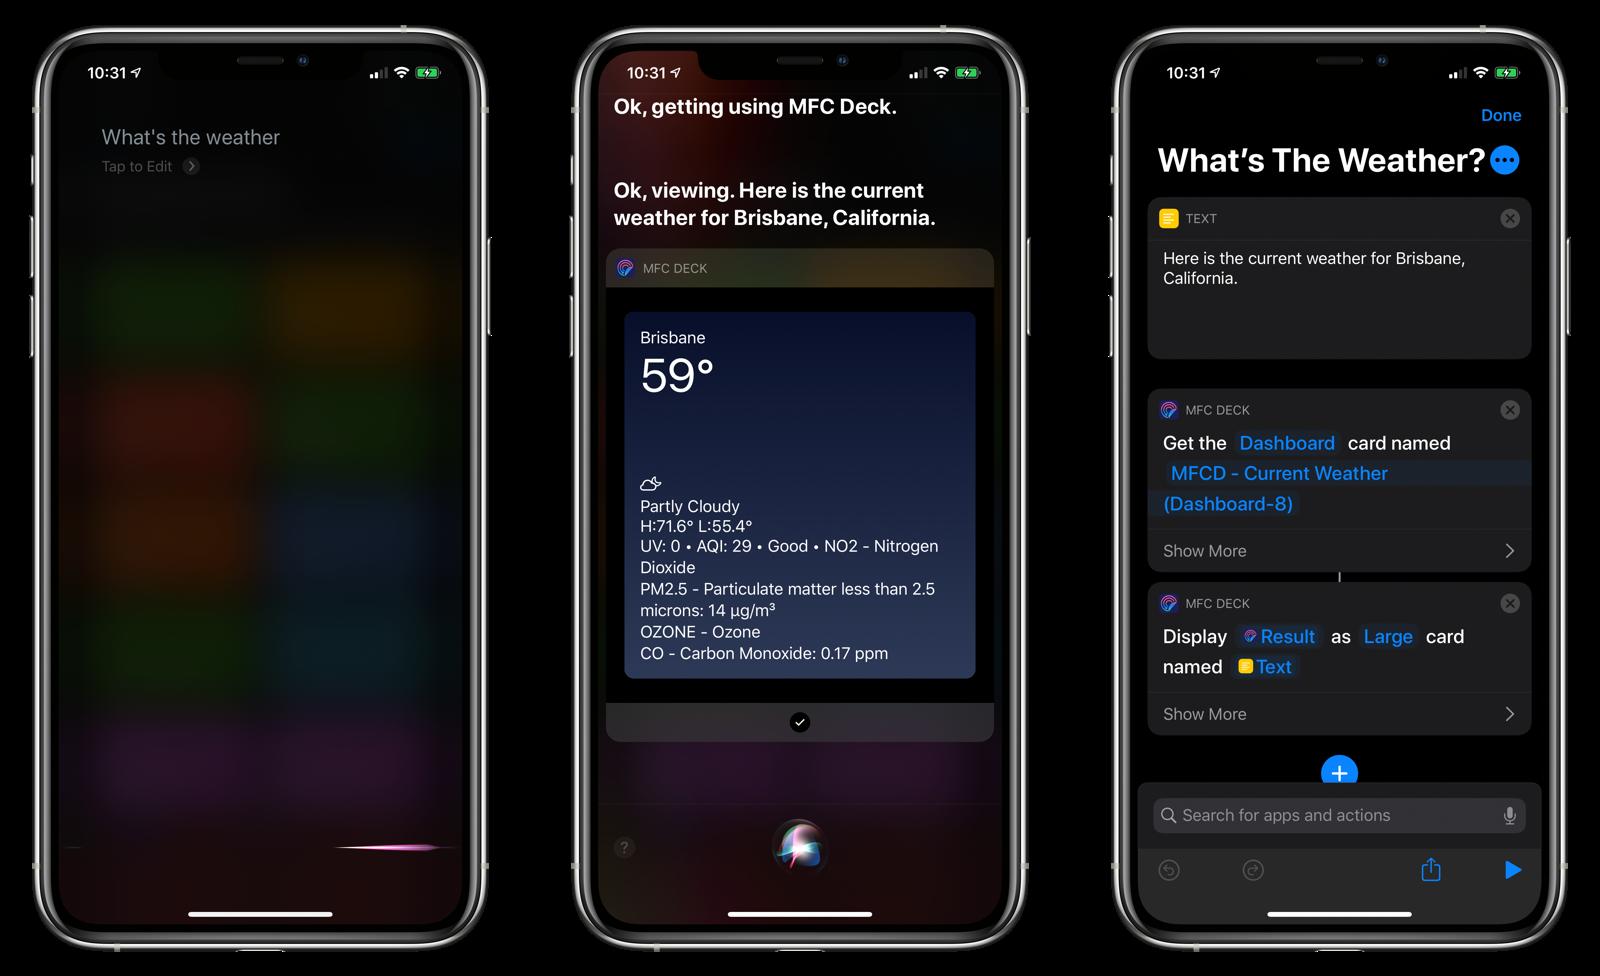 Siri response using MFC Deck